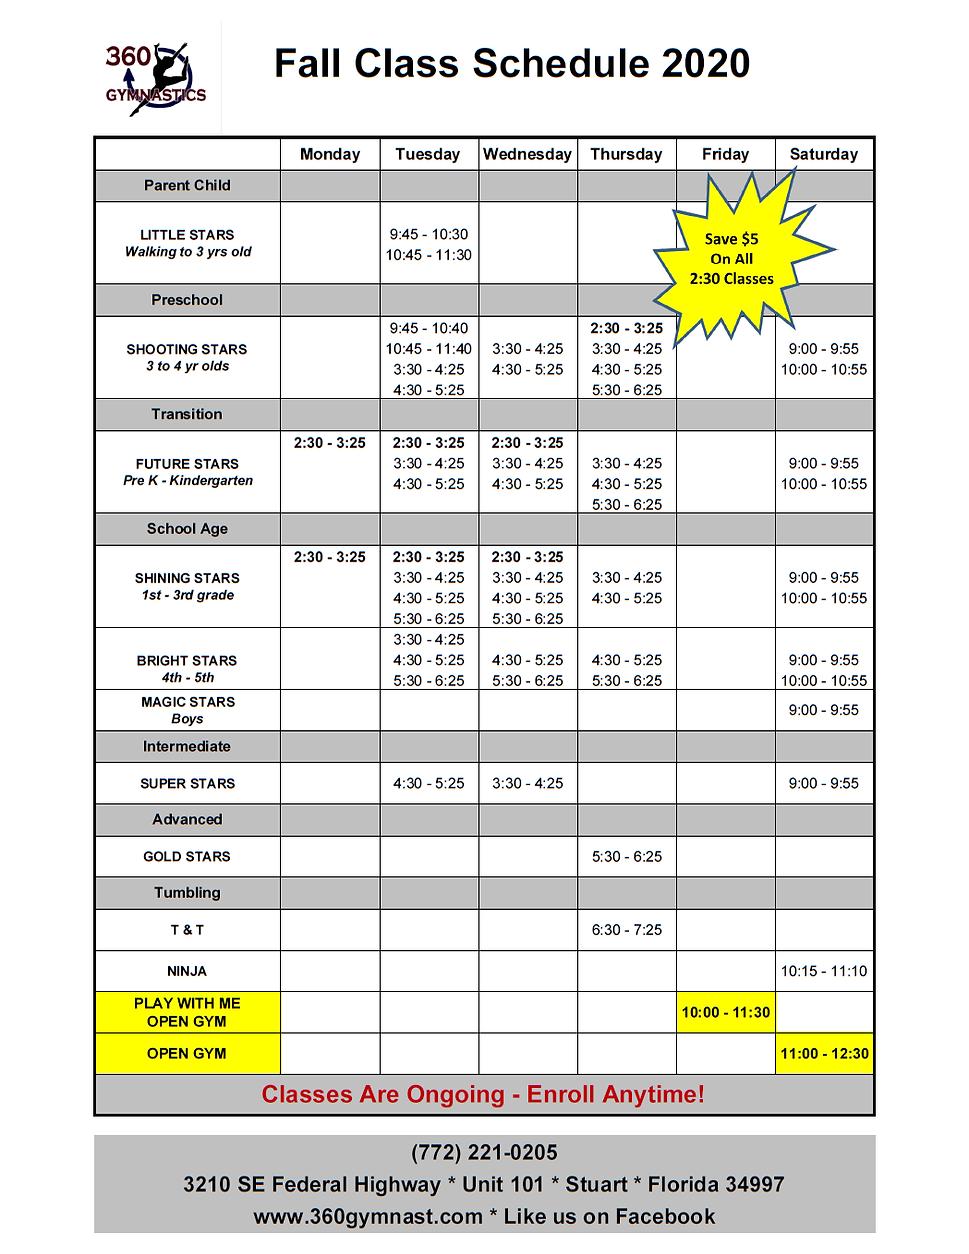 2020 Fall Class Schedule.png